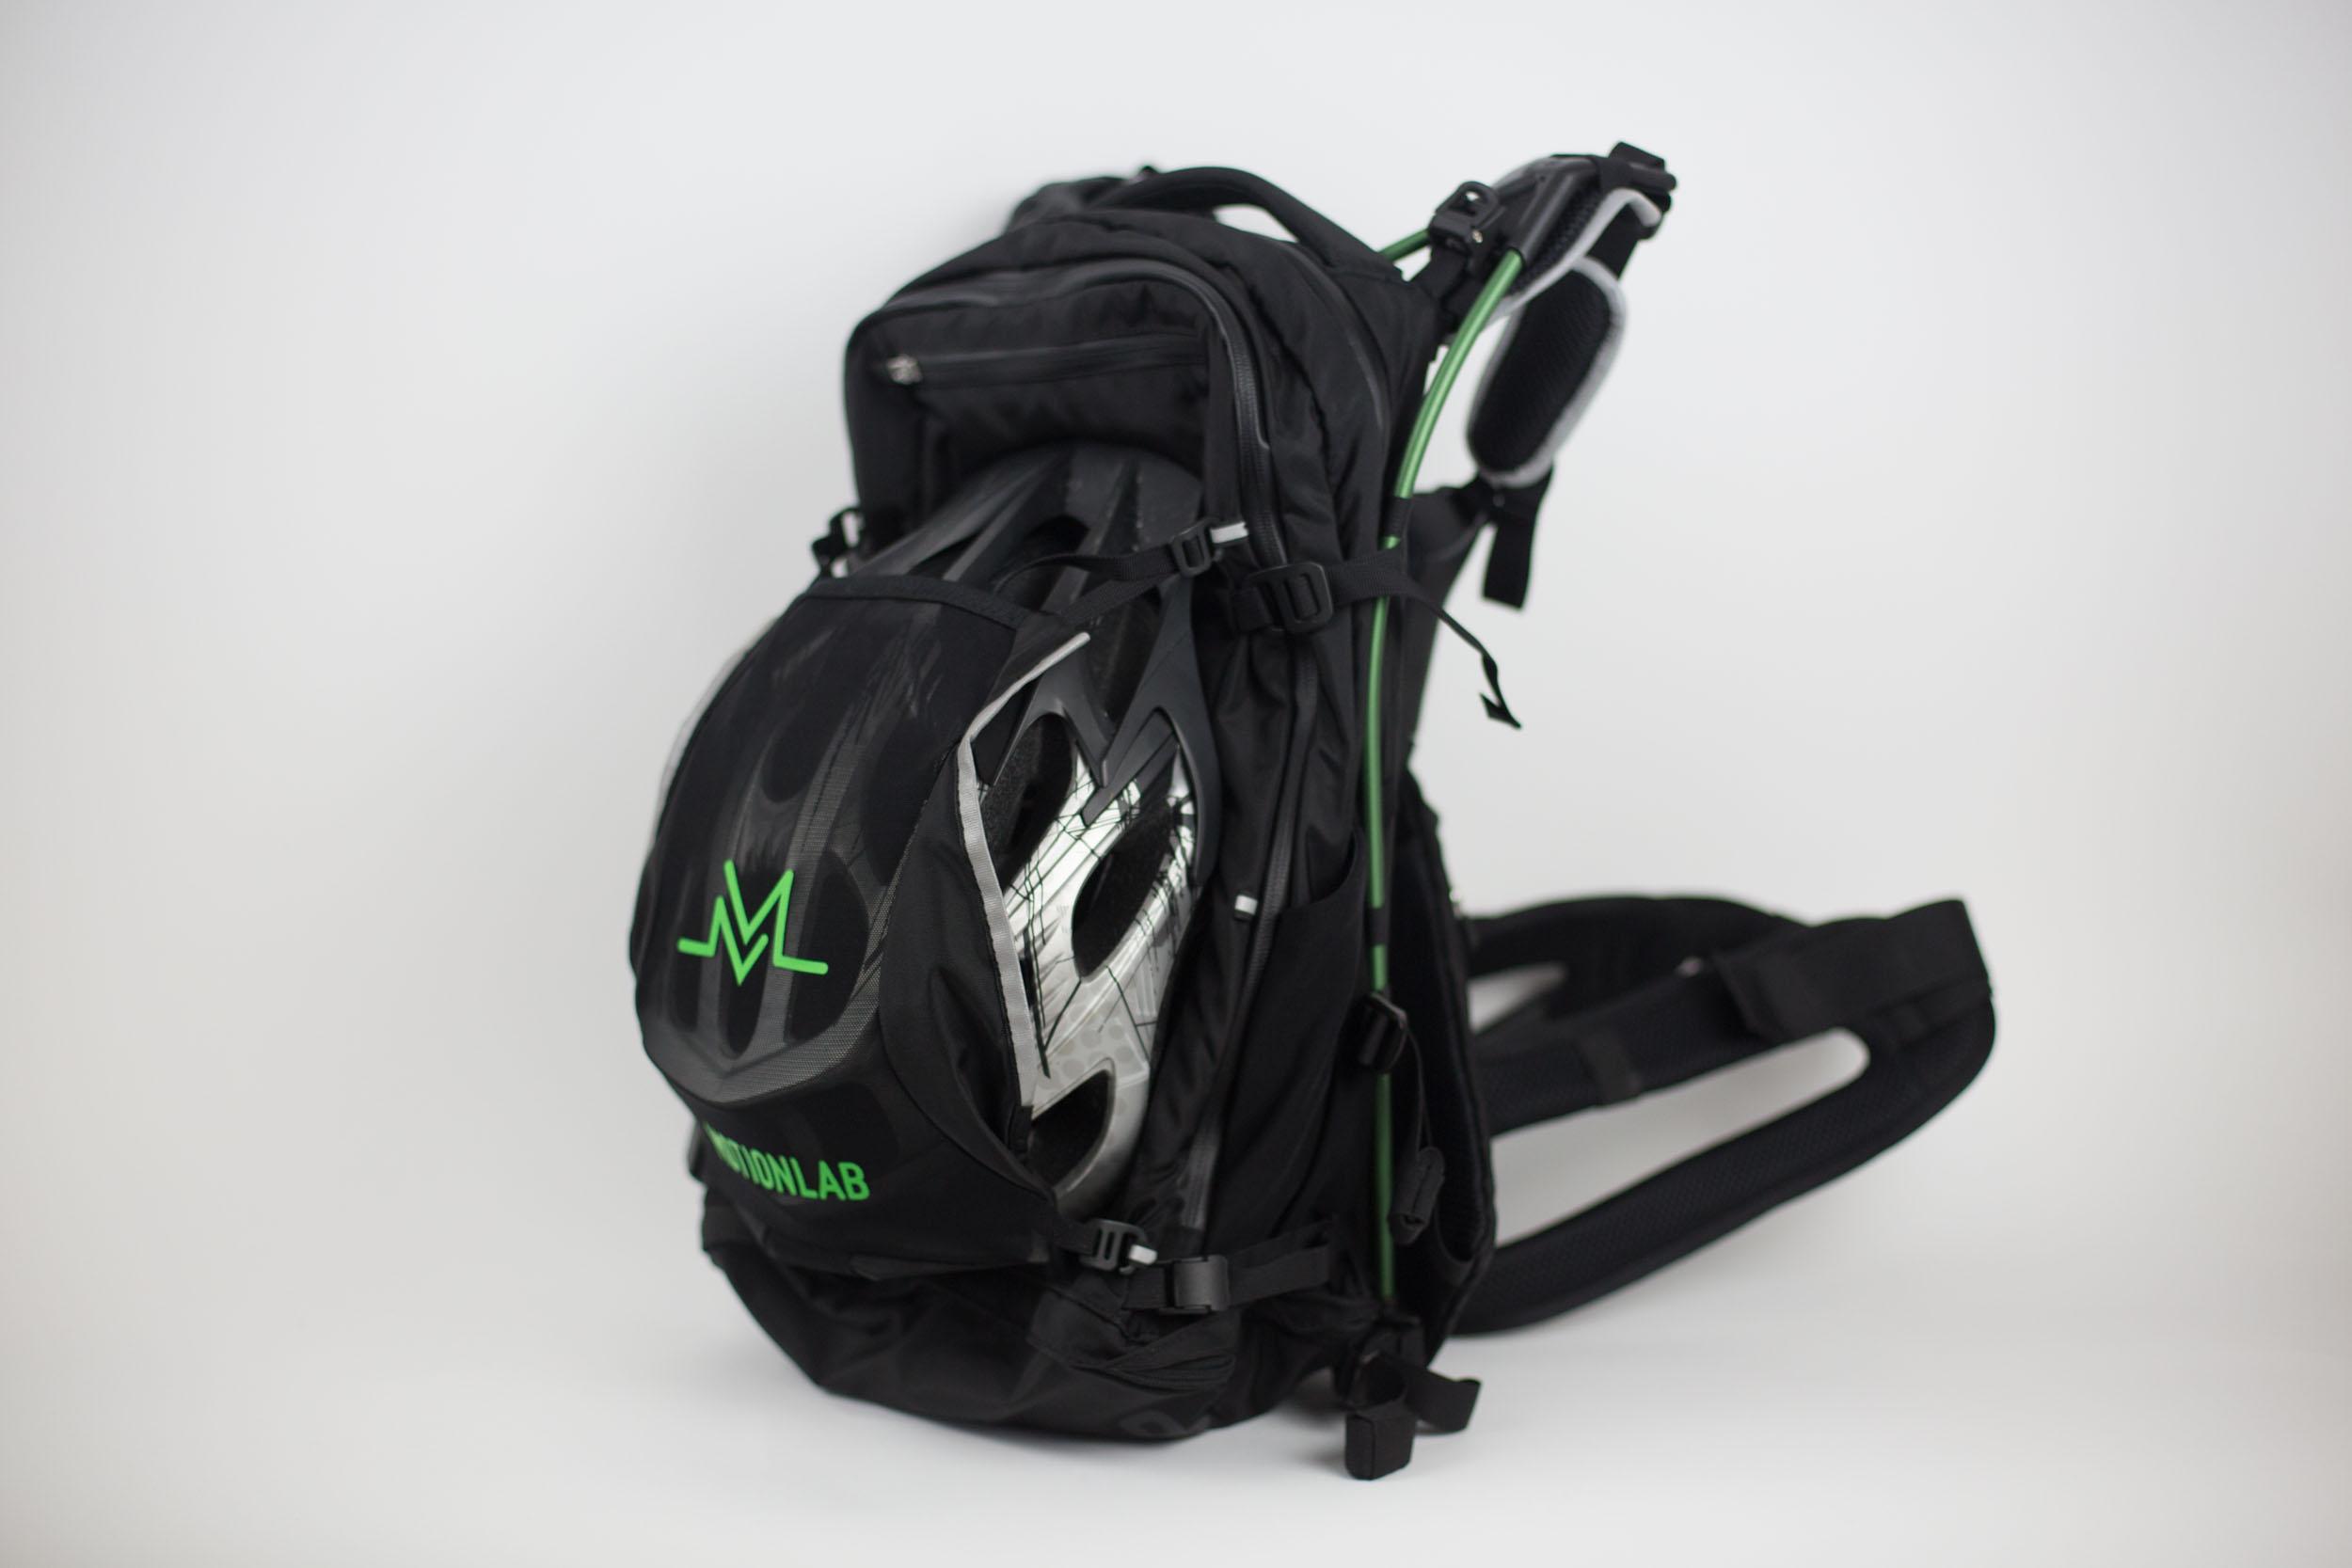 https://www.motionlab-bags.com/wp-content/uploads/445A3439.jpg